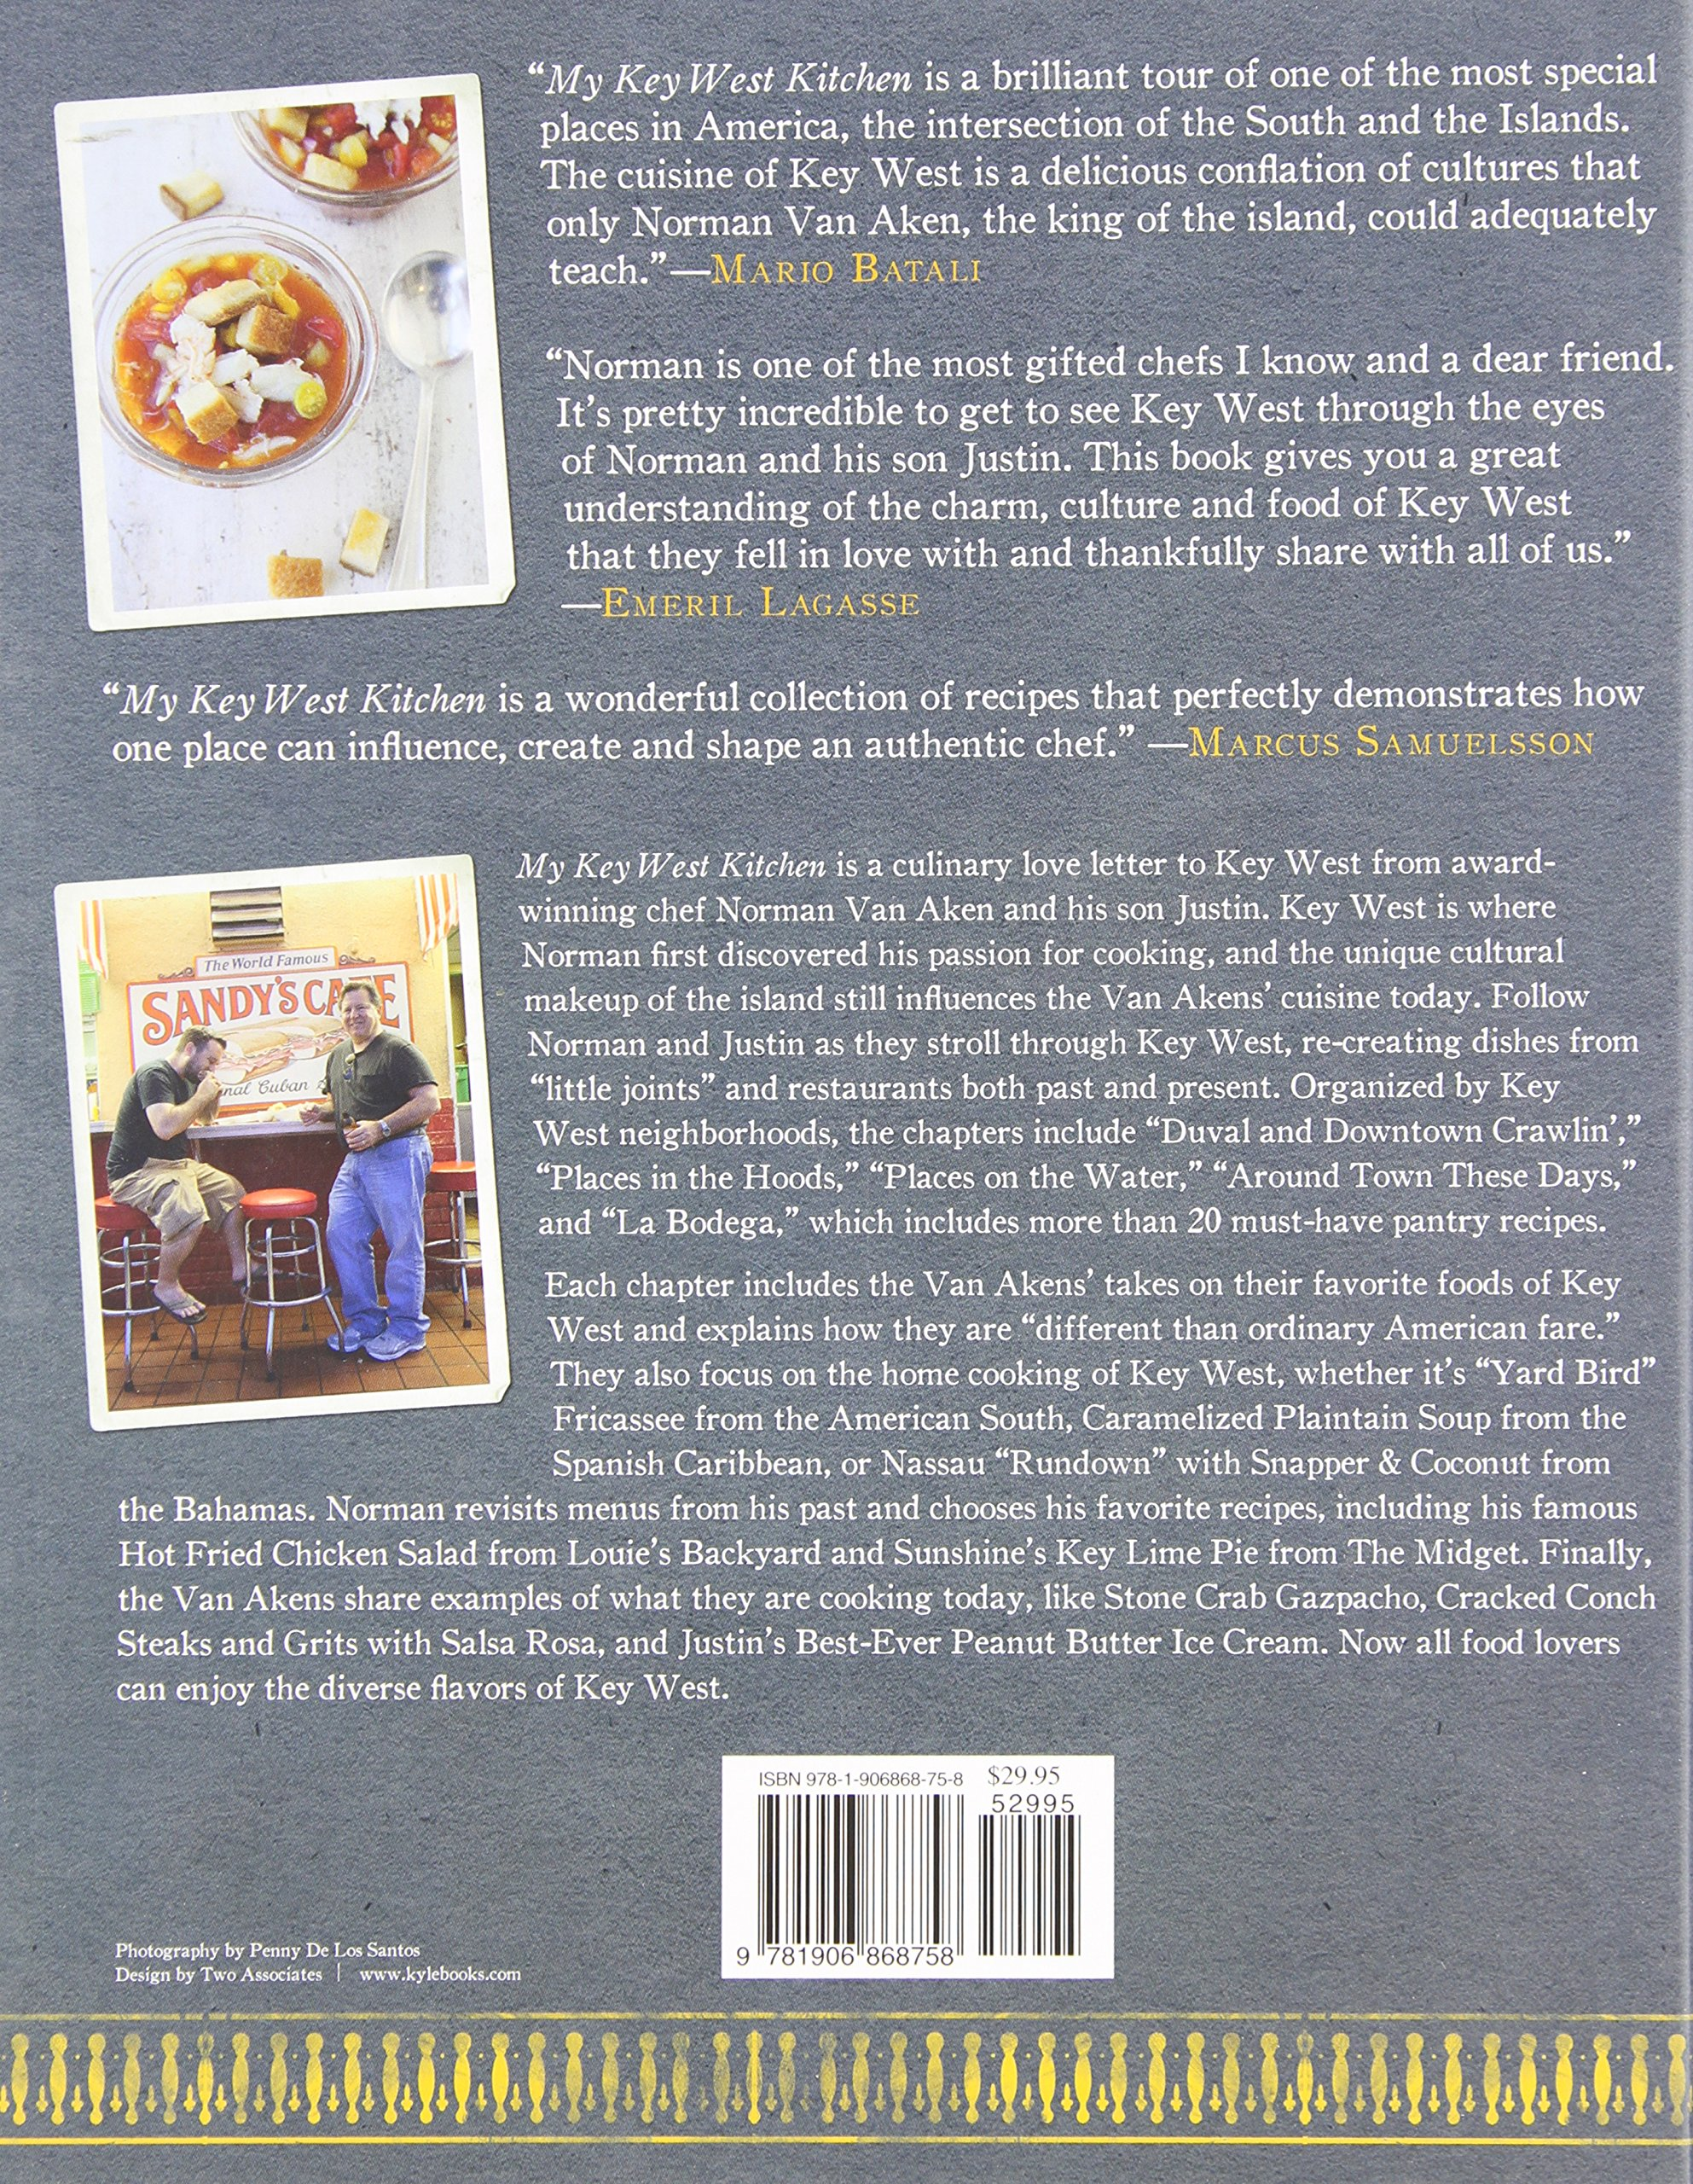 My Key West Kitchen: Recipes and Stories: Norman Van Aken, Justin ...